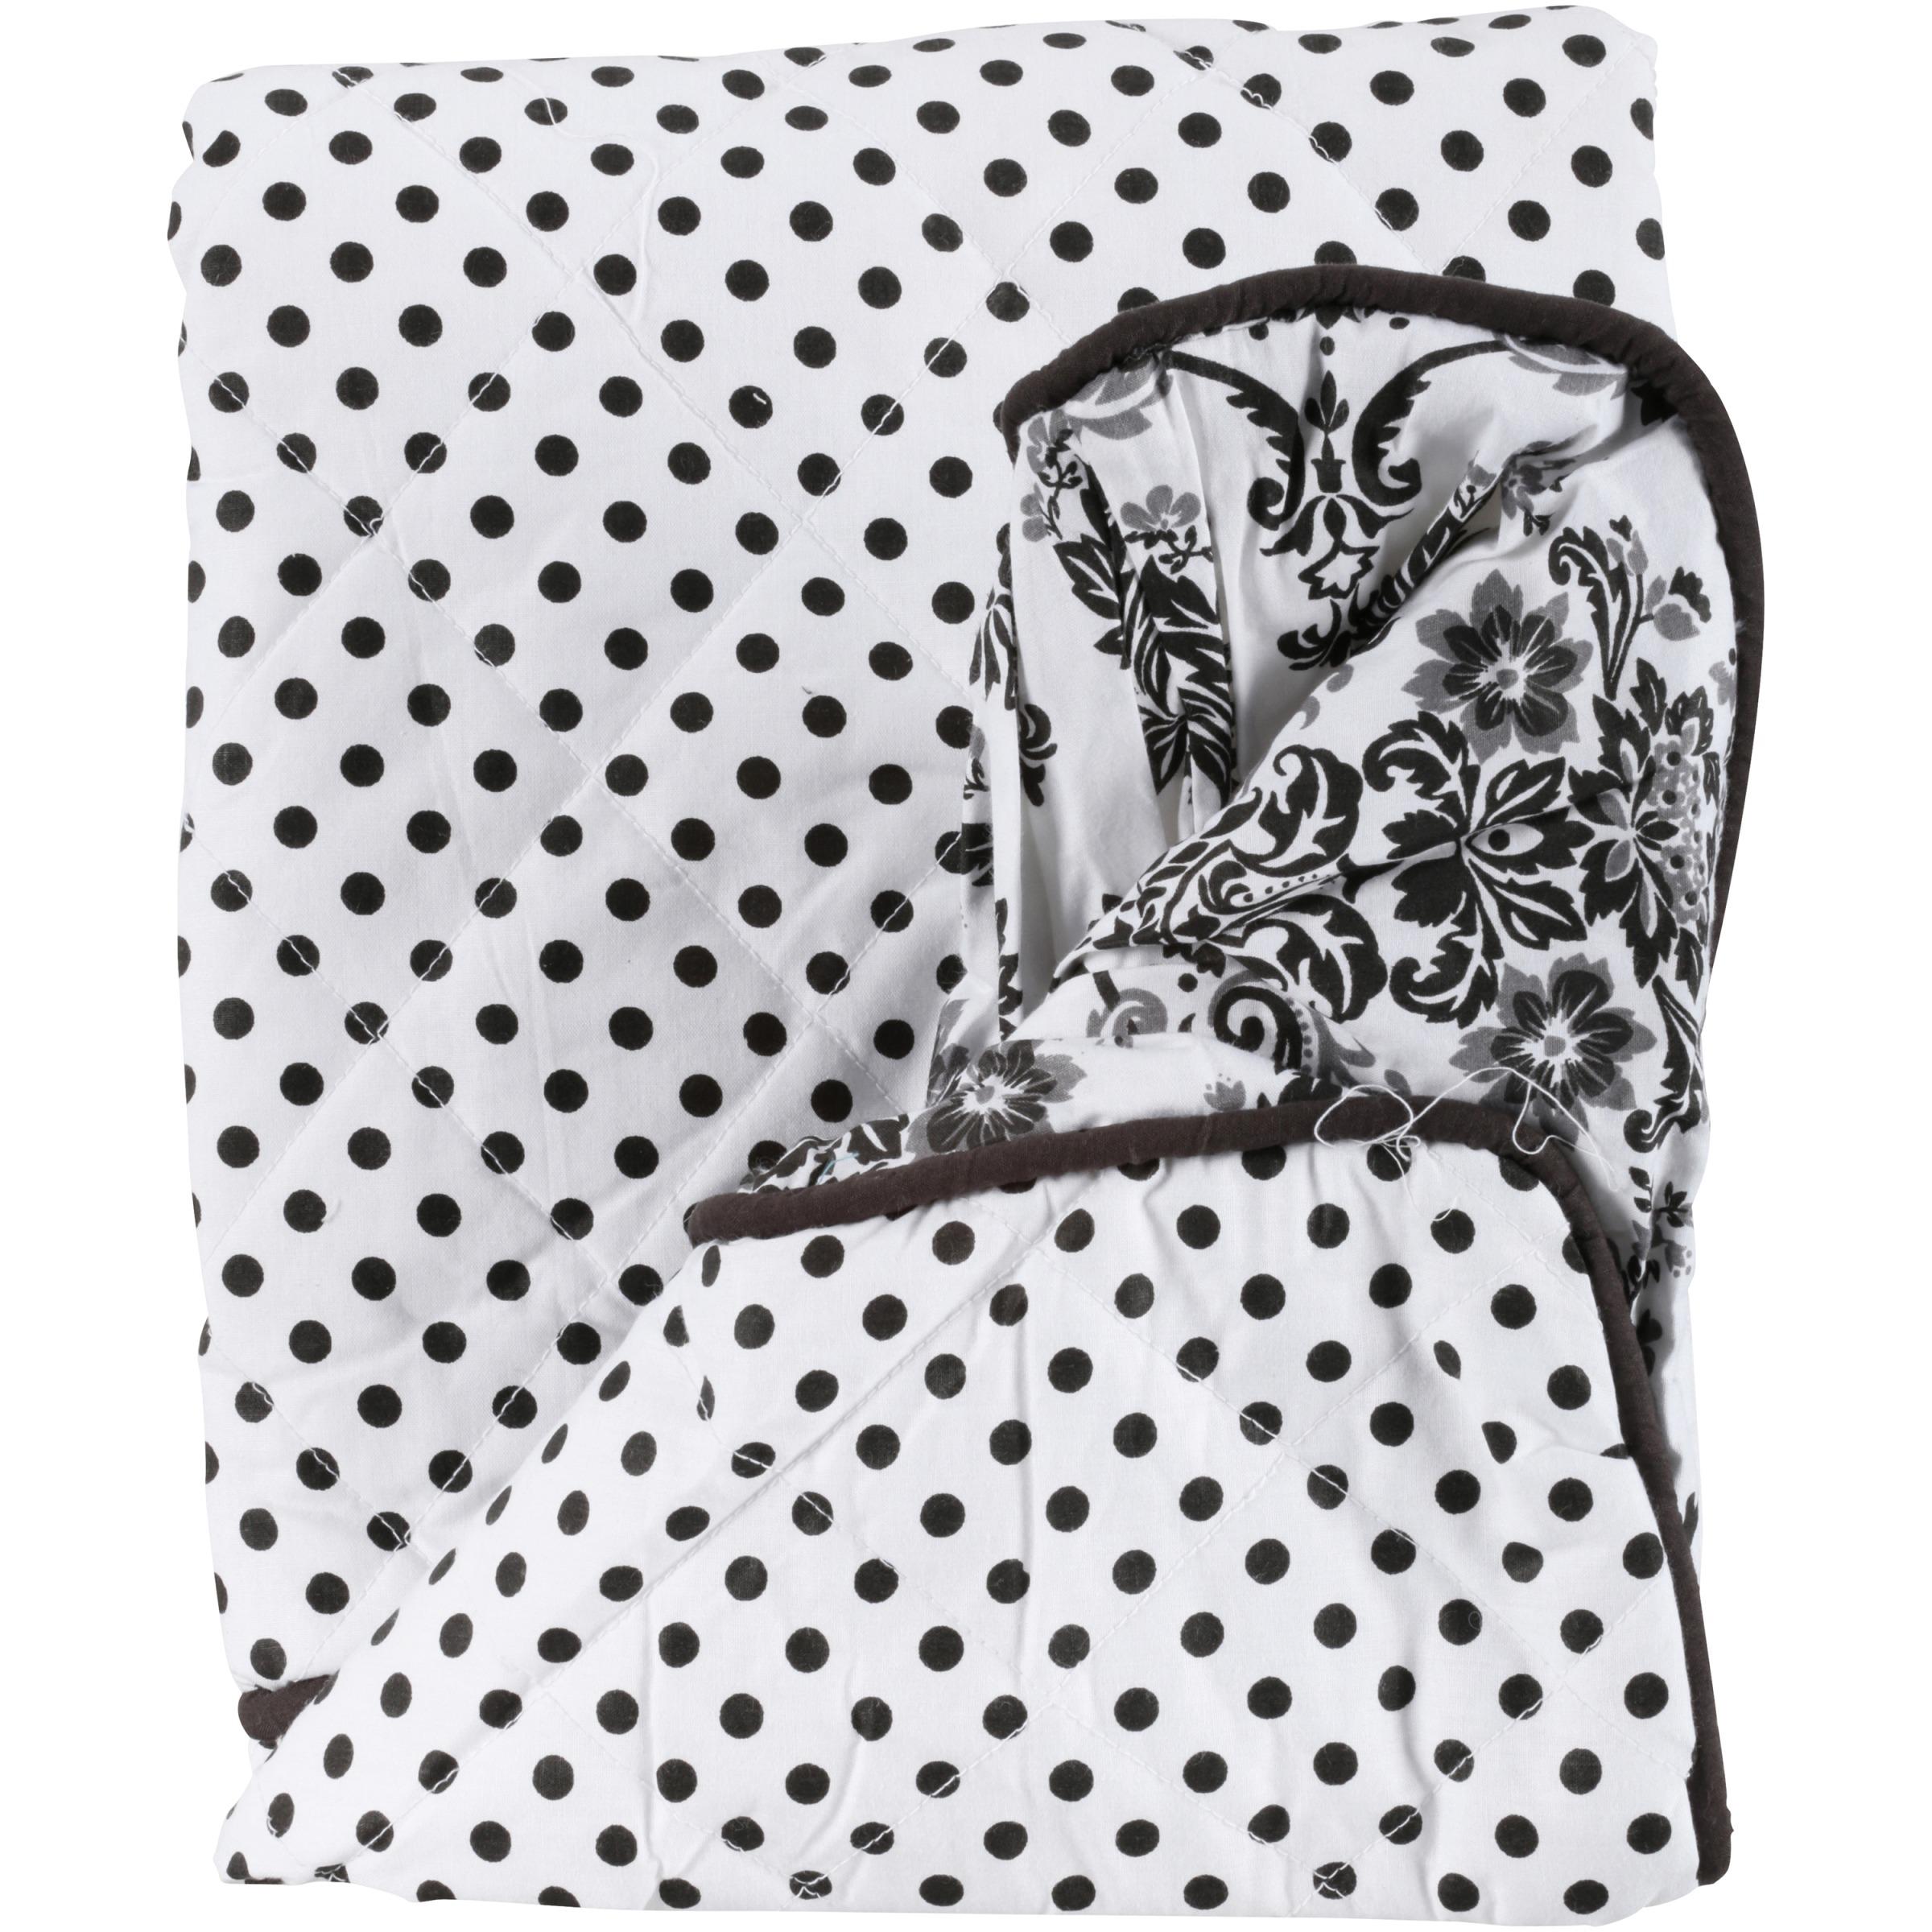 Bacati Black/White Polka Dots & Stripes Changing Pad Cover